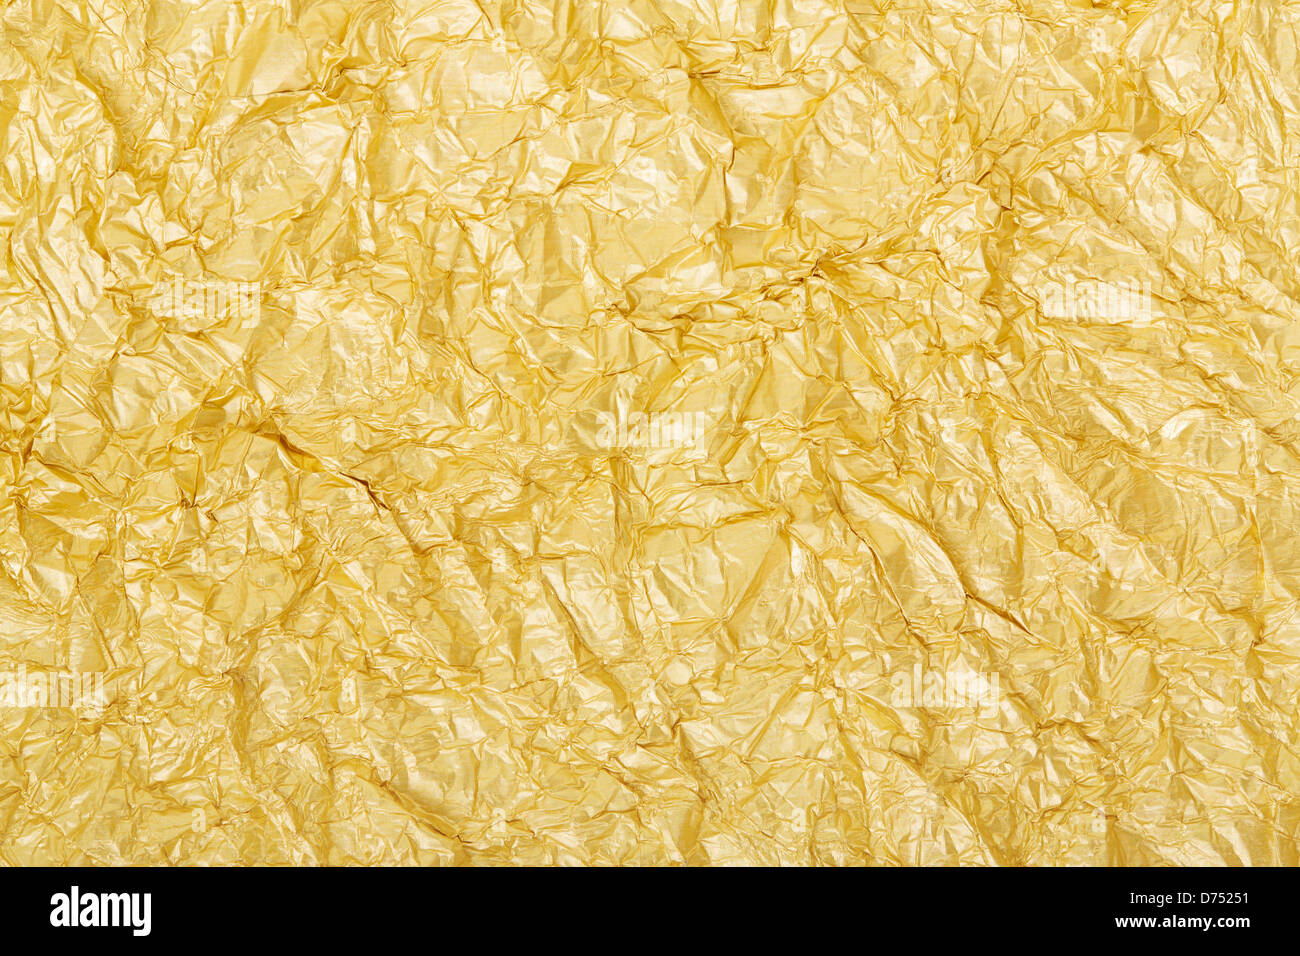 Goldfolie Hintergrundtextur Stockbild